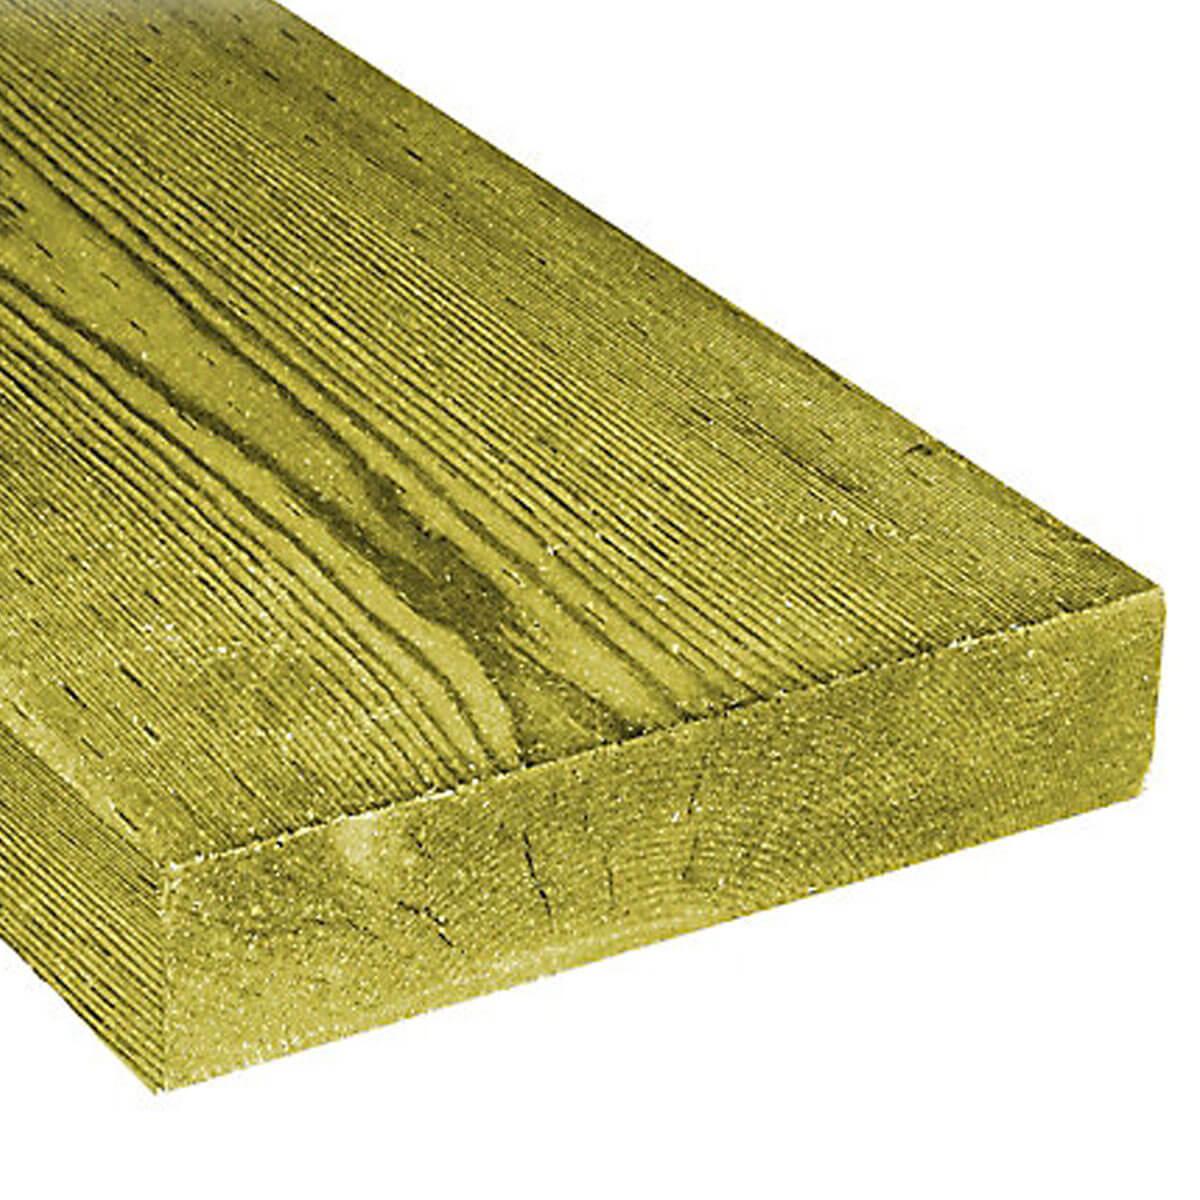 Treated Ground Contact Lumber - P/T - .40 - 2 x 6 x 12'